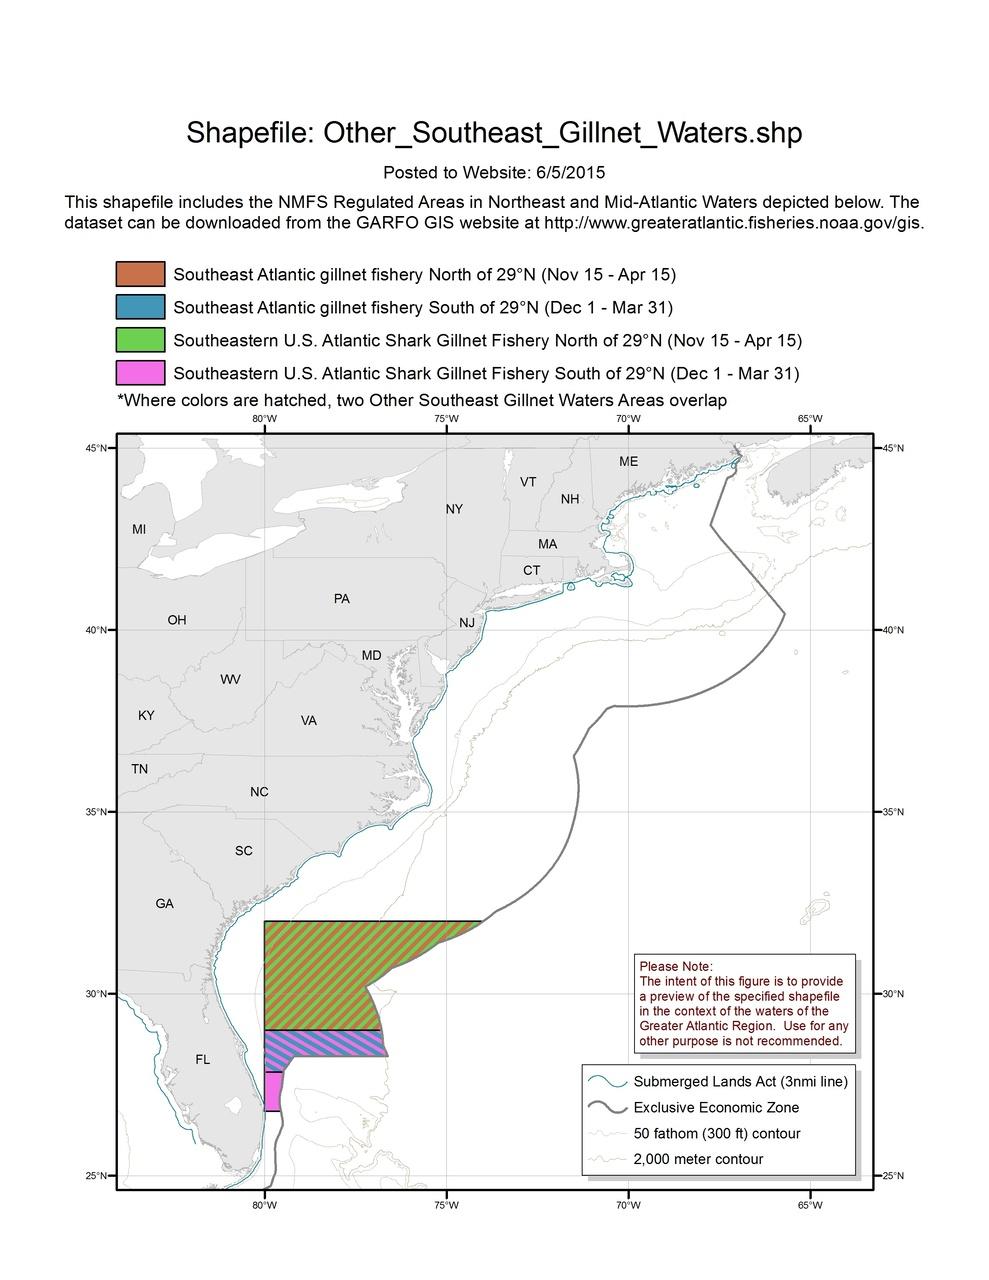 Other-Southeast-Gillnet-Waters-MAP-NOAA-GARFO.jpg